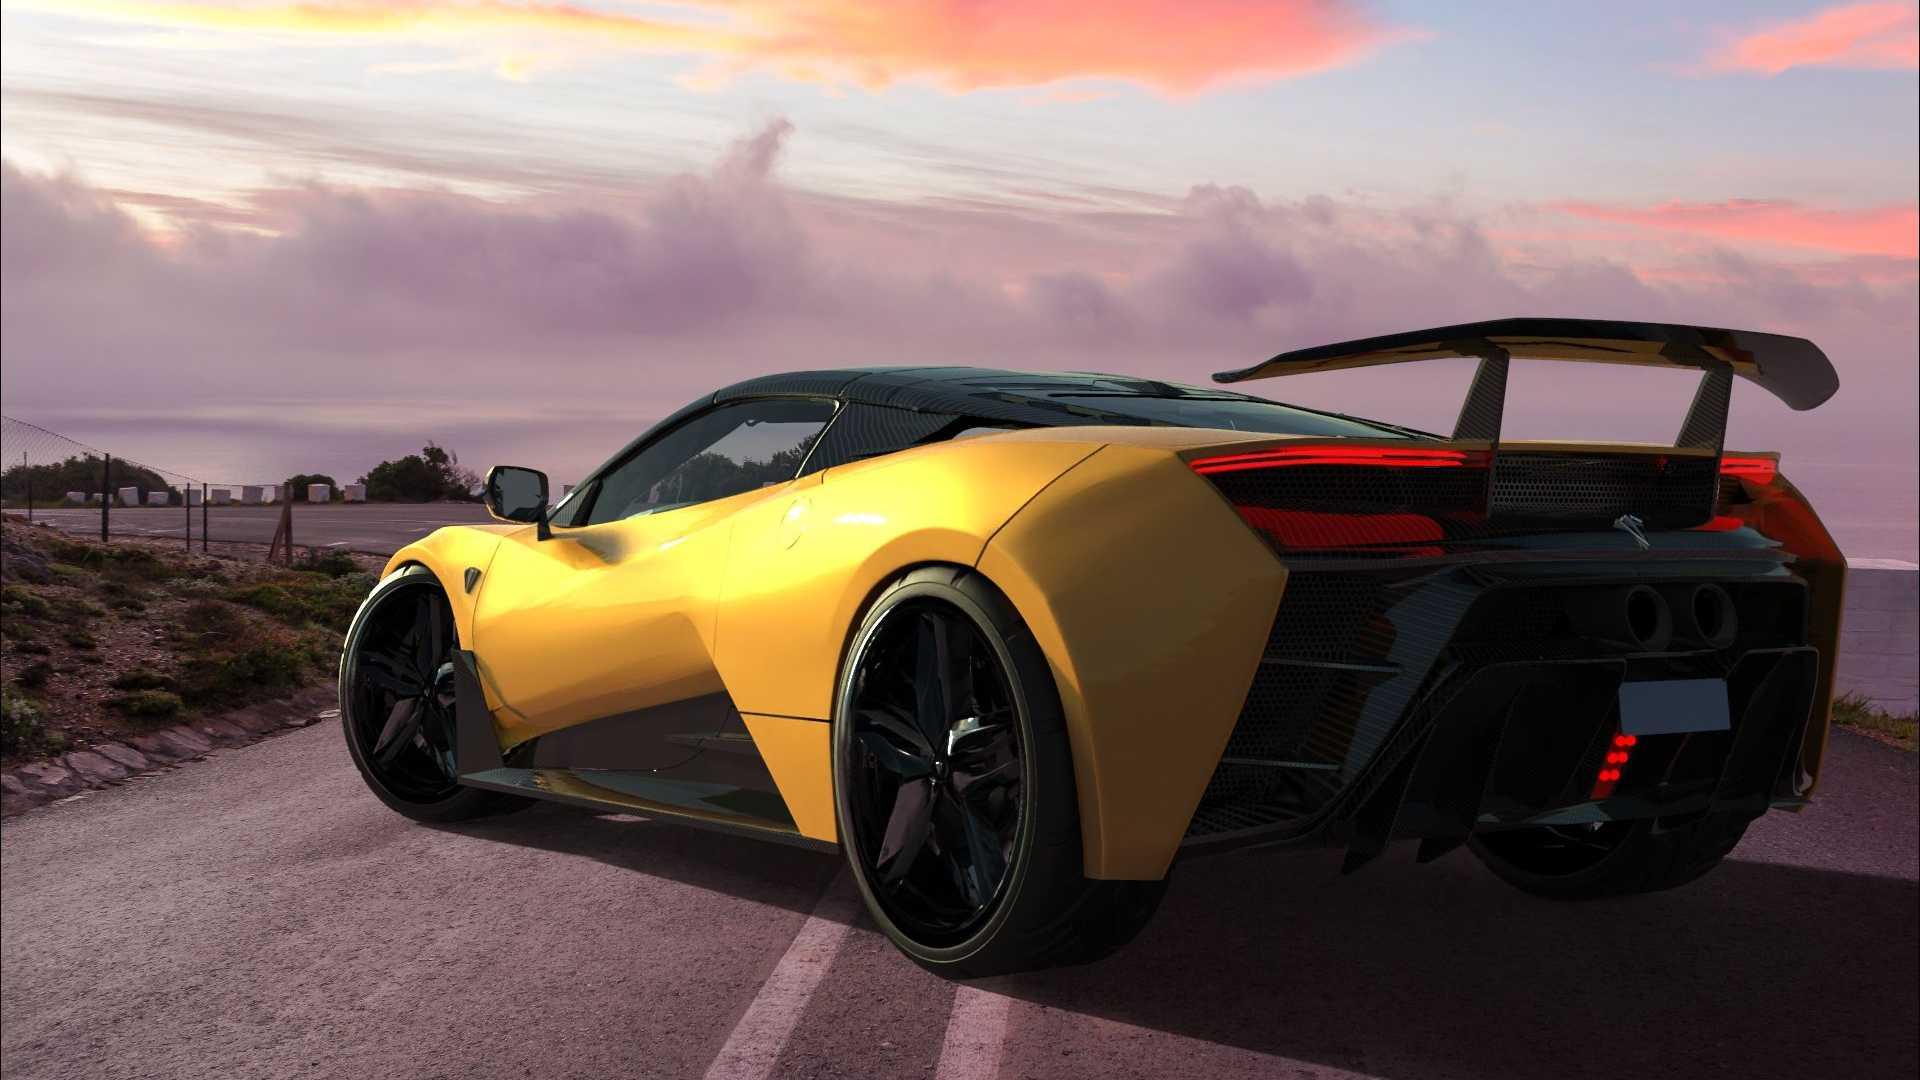 Arrera-Automobili-Illyrian-Pure-Sport-Renderings-10